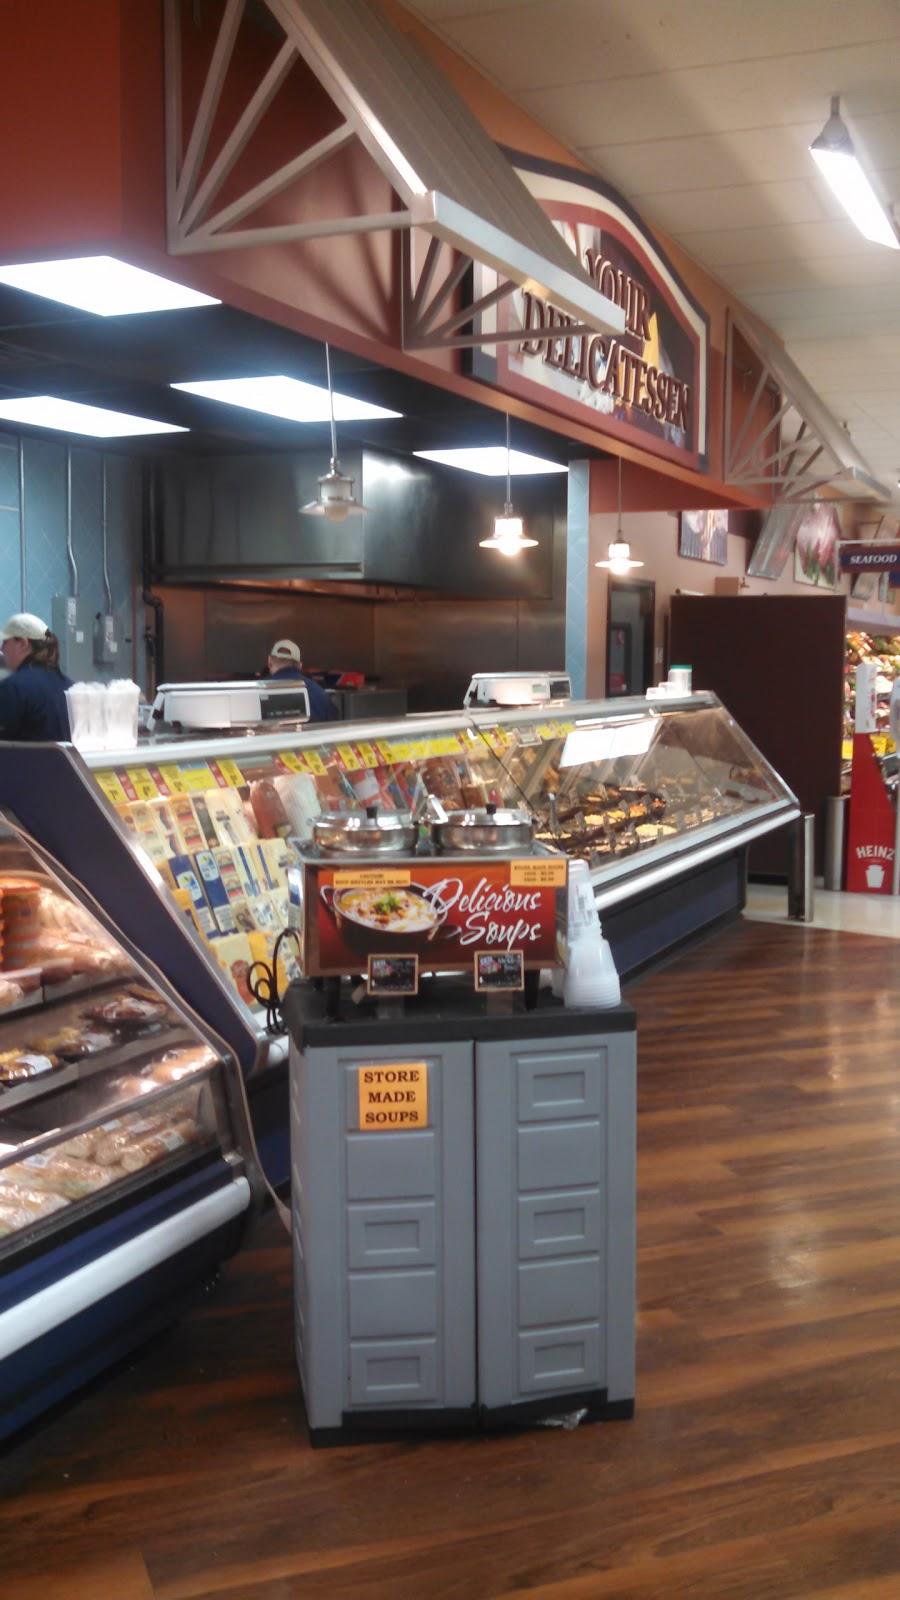 Foodtown of Shickshinny - florist  | Photo 3 of 9 | Address: 5 Mountain Mall, Shickshinny, PA 18655, USA | Phone: (570) 542-5522